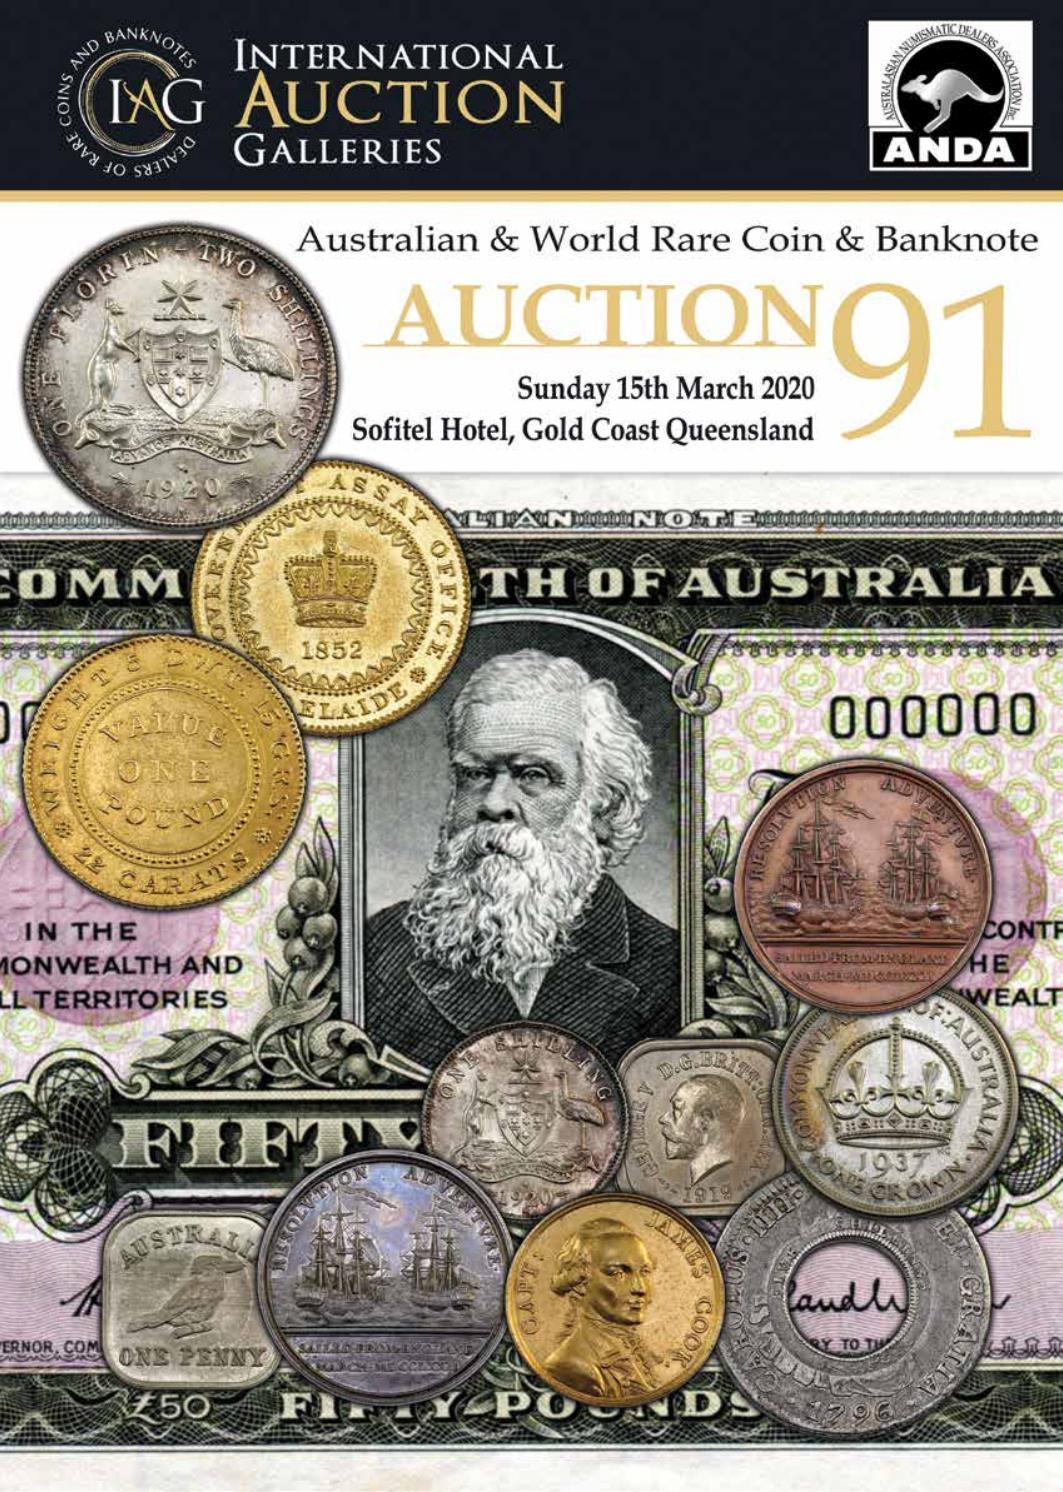 AUSTRALIA $5 2016 Consecutive Prefix Matching Serial AF /& AG x 2 UNC Banknotes